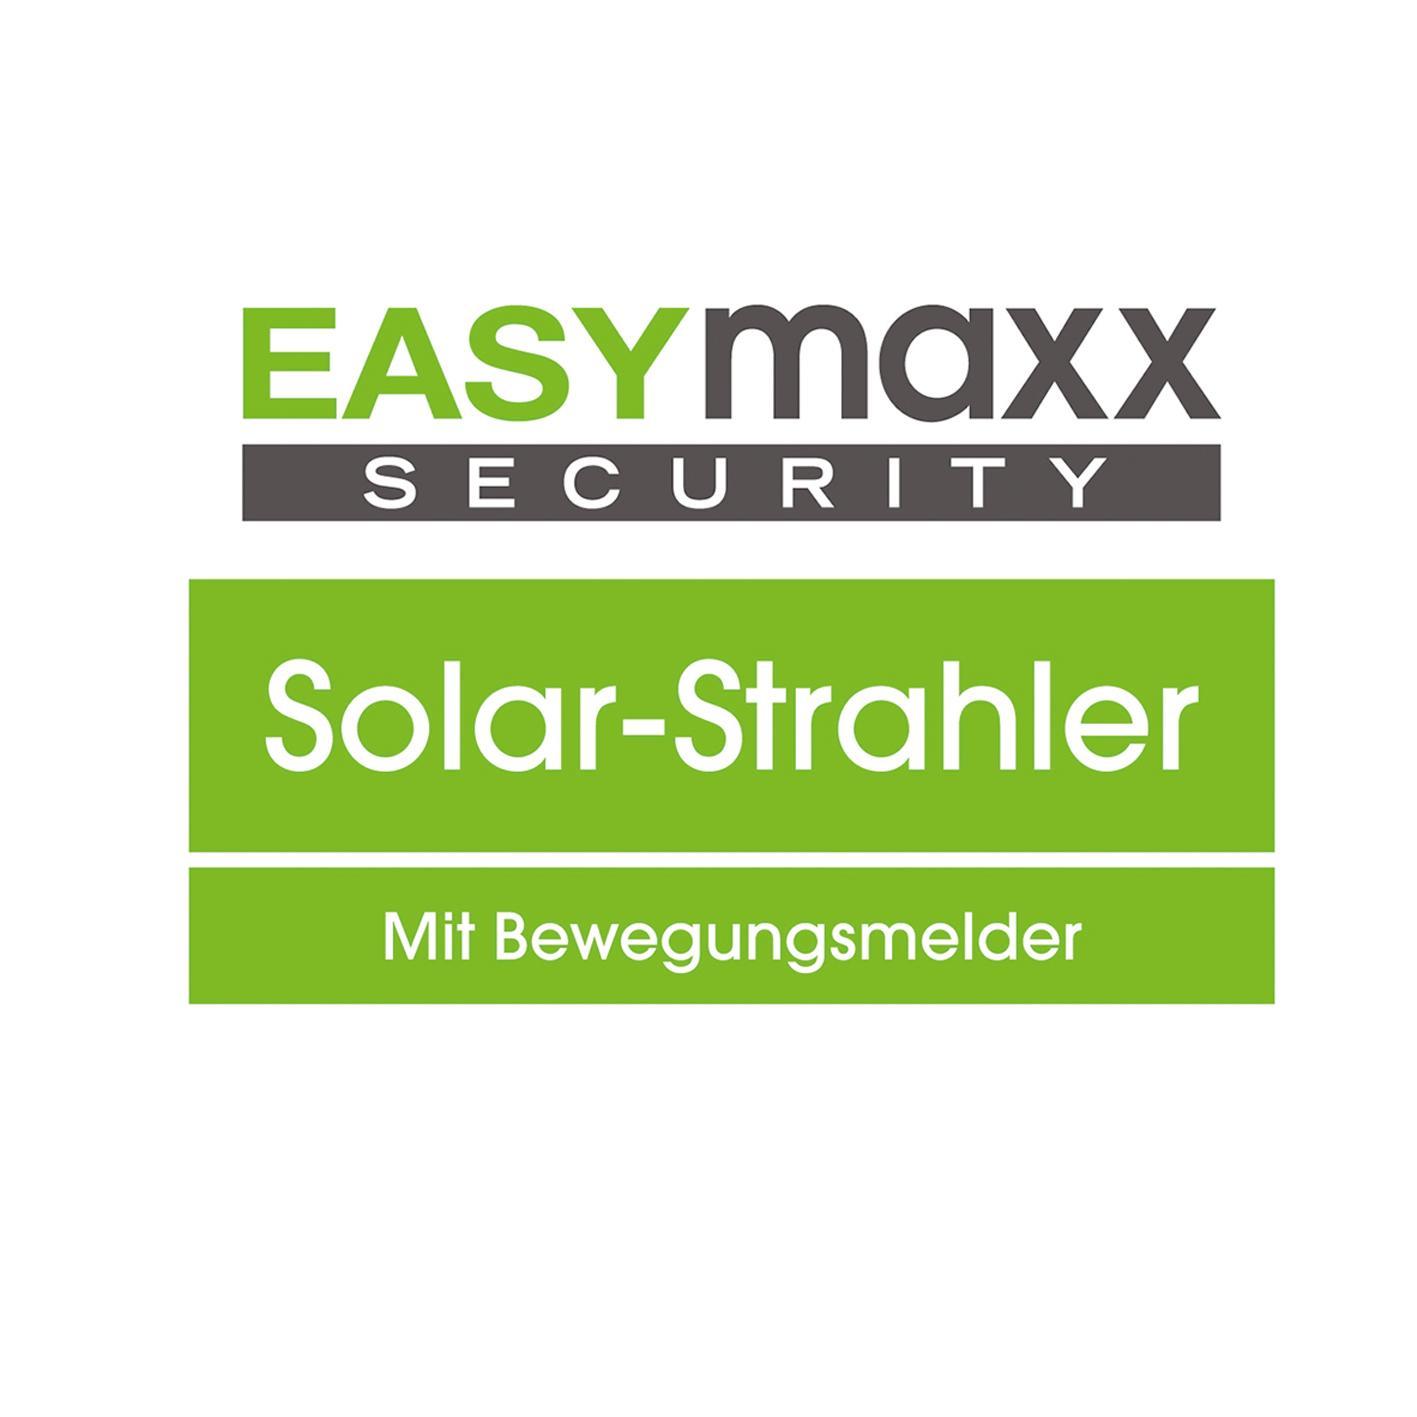 easymaxx 06839 solar strahler security plus led solarstrahler mit bewegungsmelder und. Black Bedroom Furniture Sets. Home Design Ideas